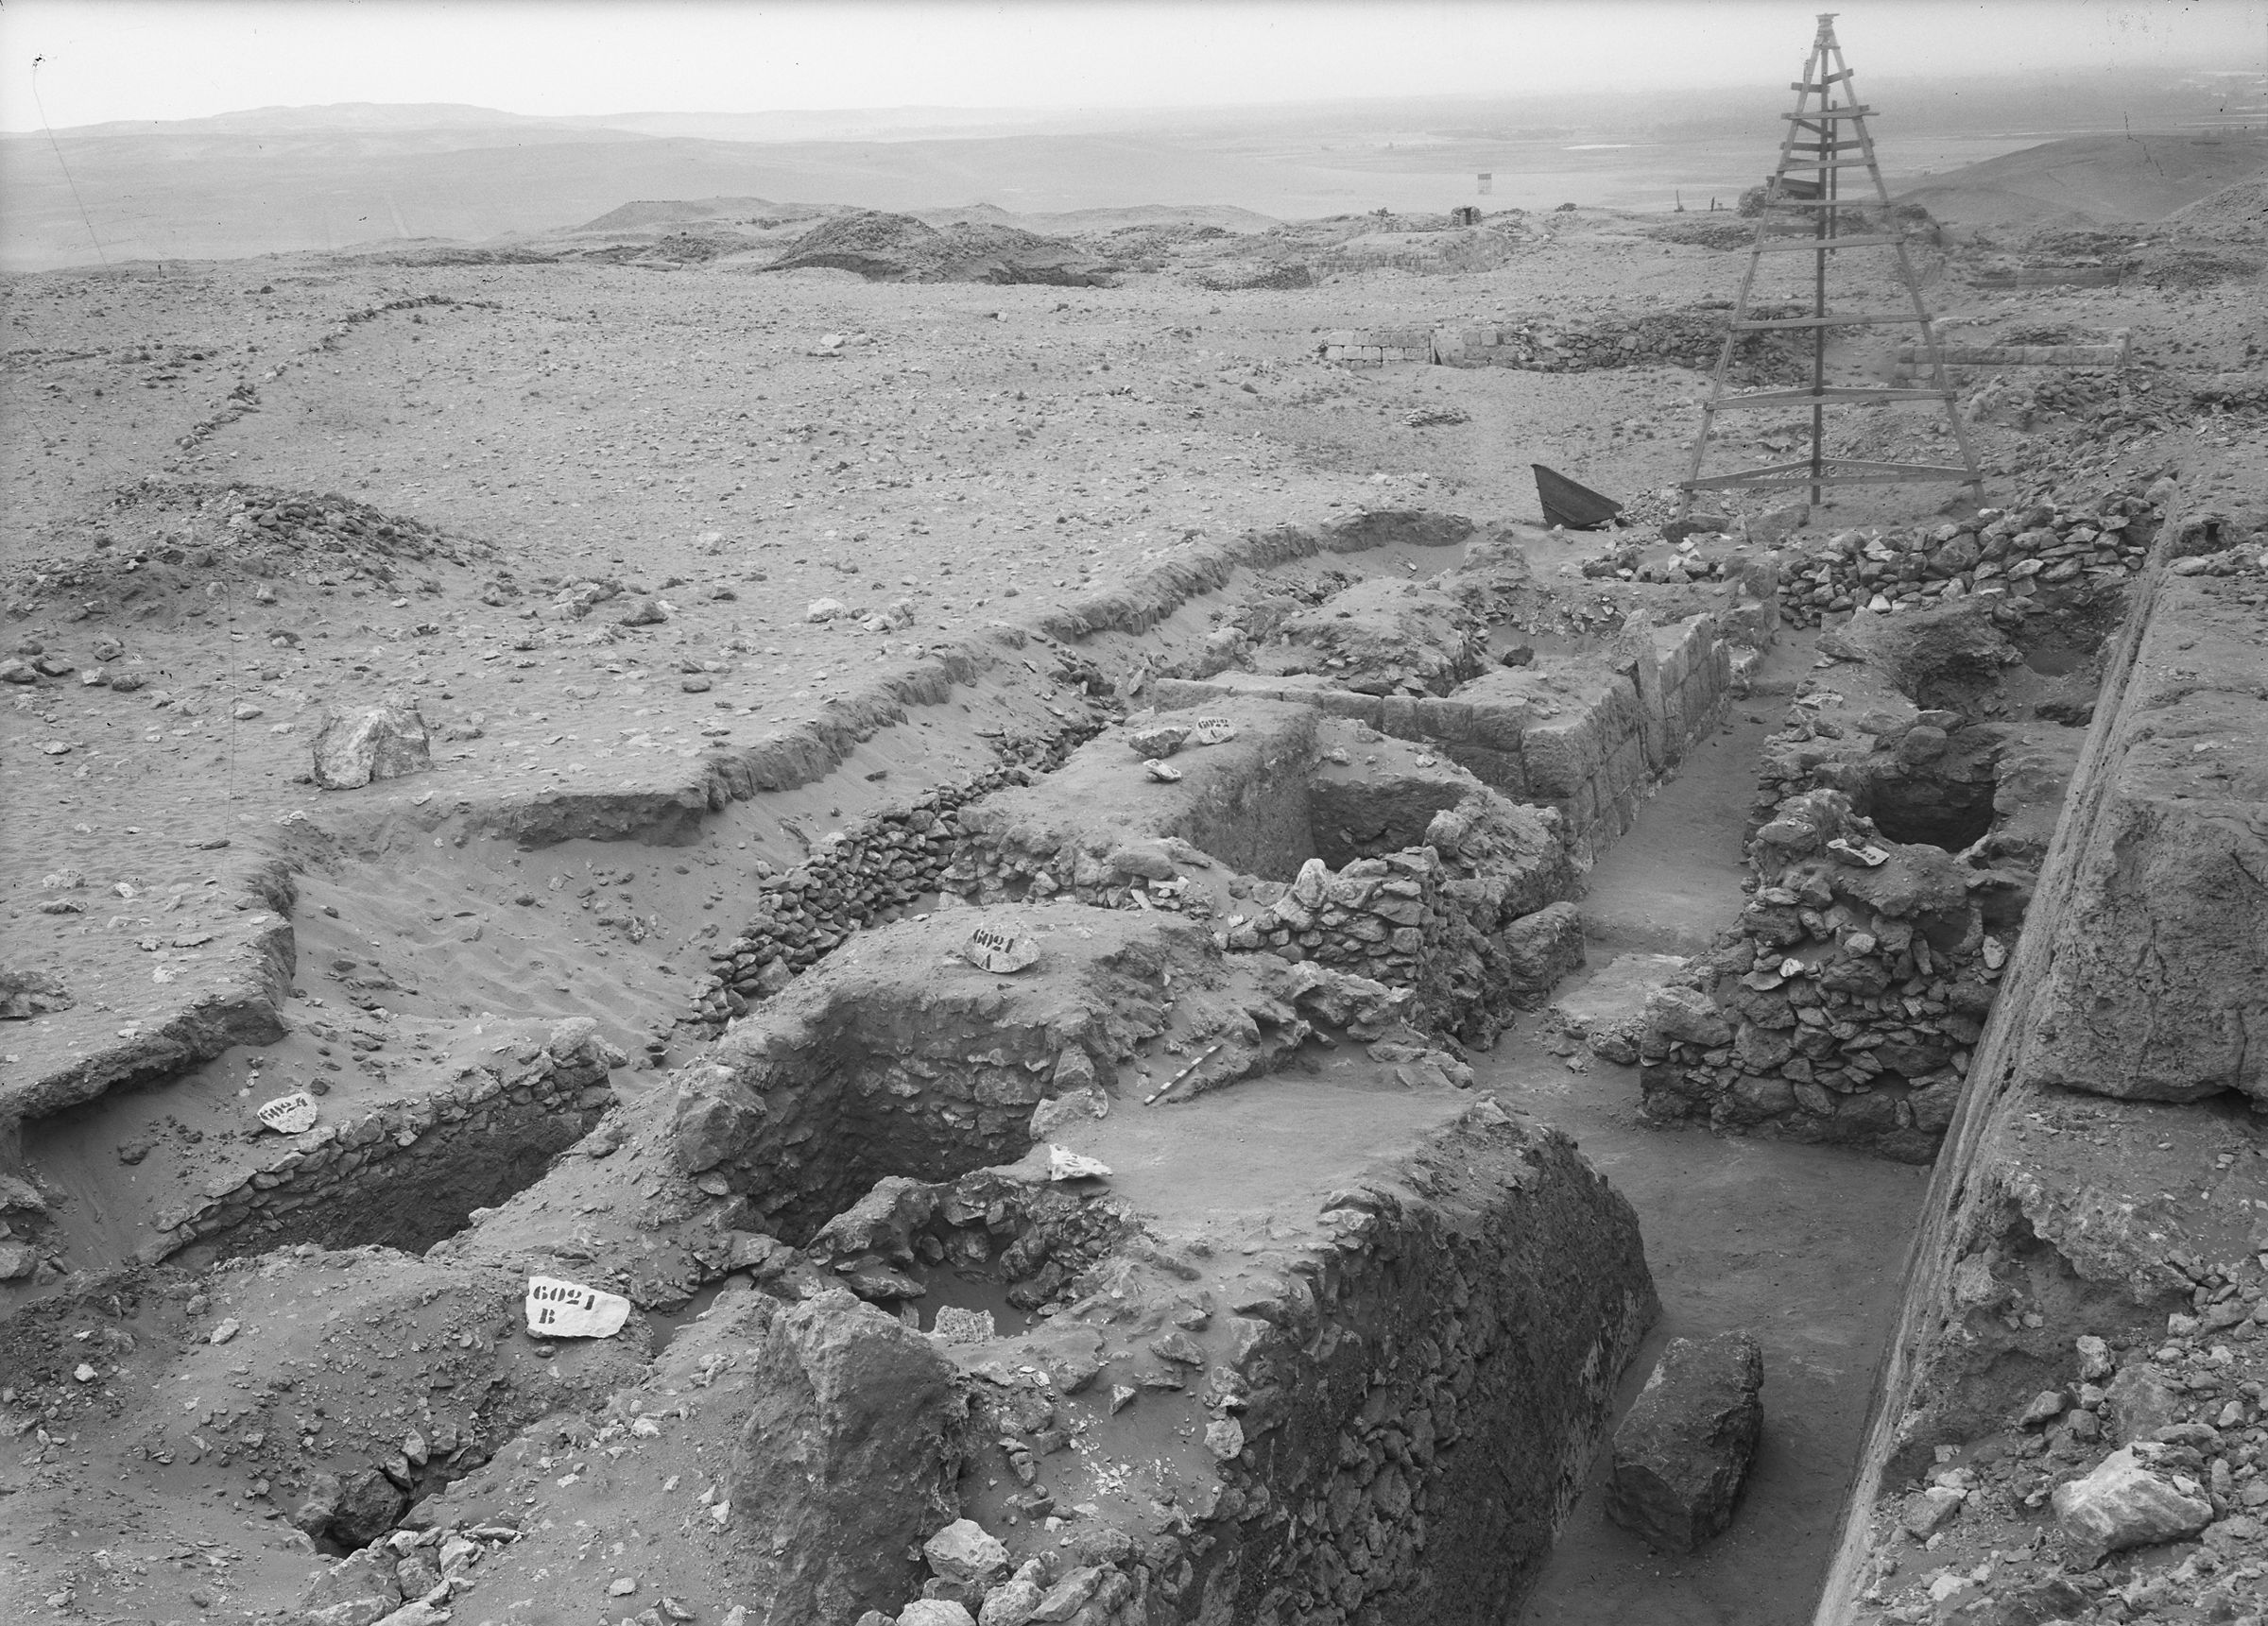 Western Cemetery: Site: Giza; View: G 6021, G 6022, G 6023, G 6024, G 6040